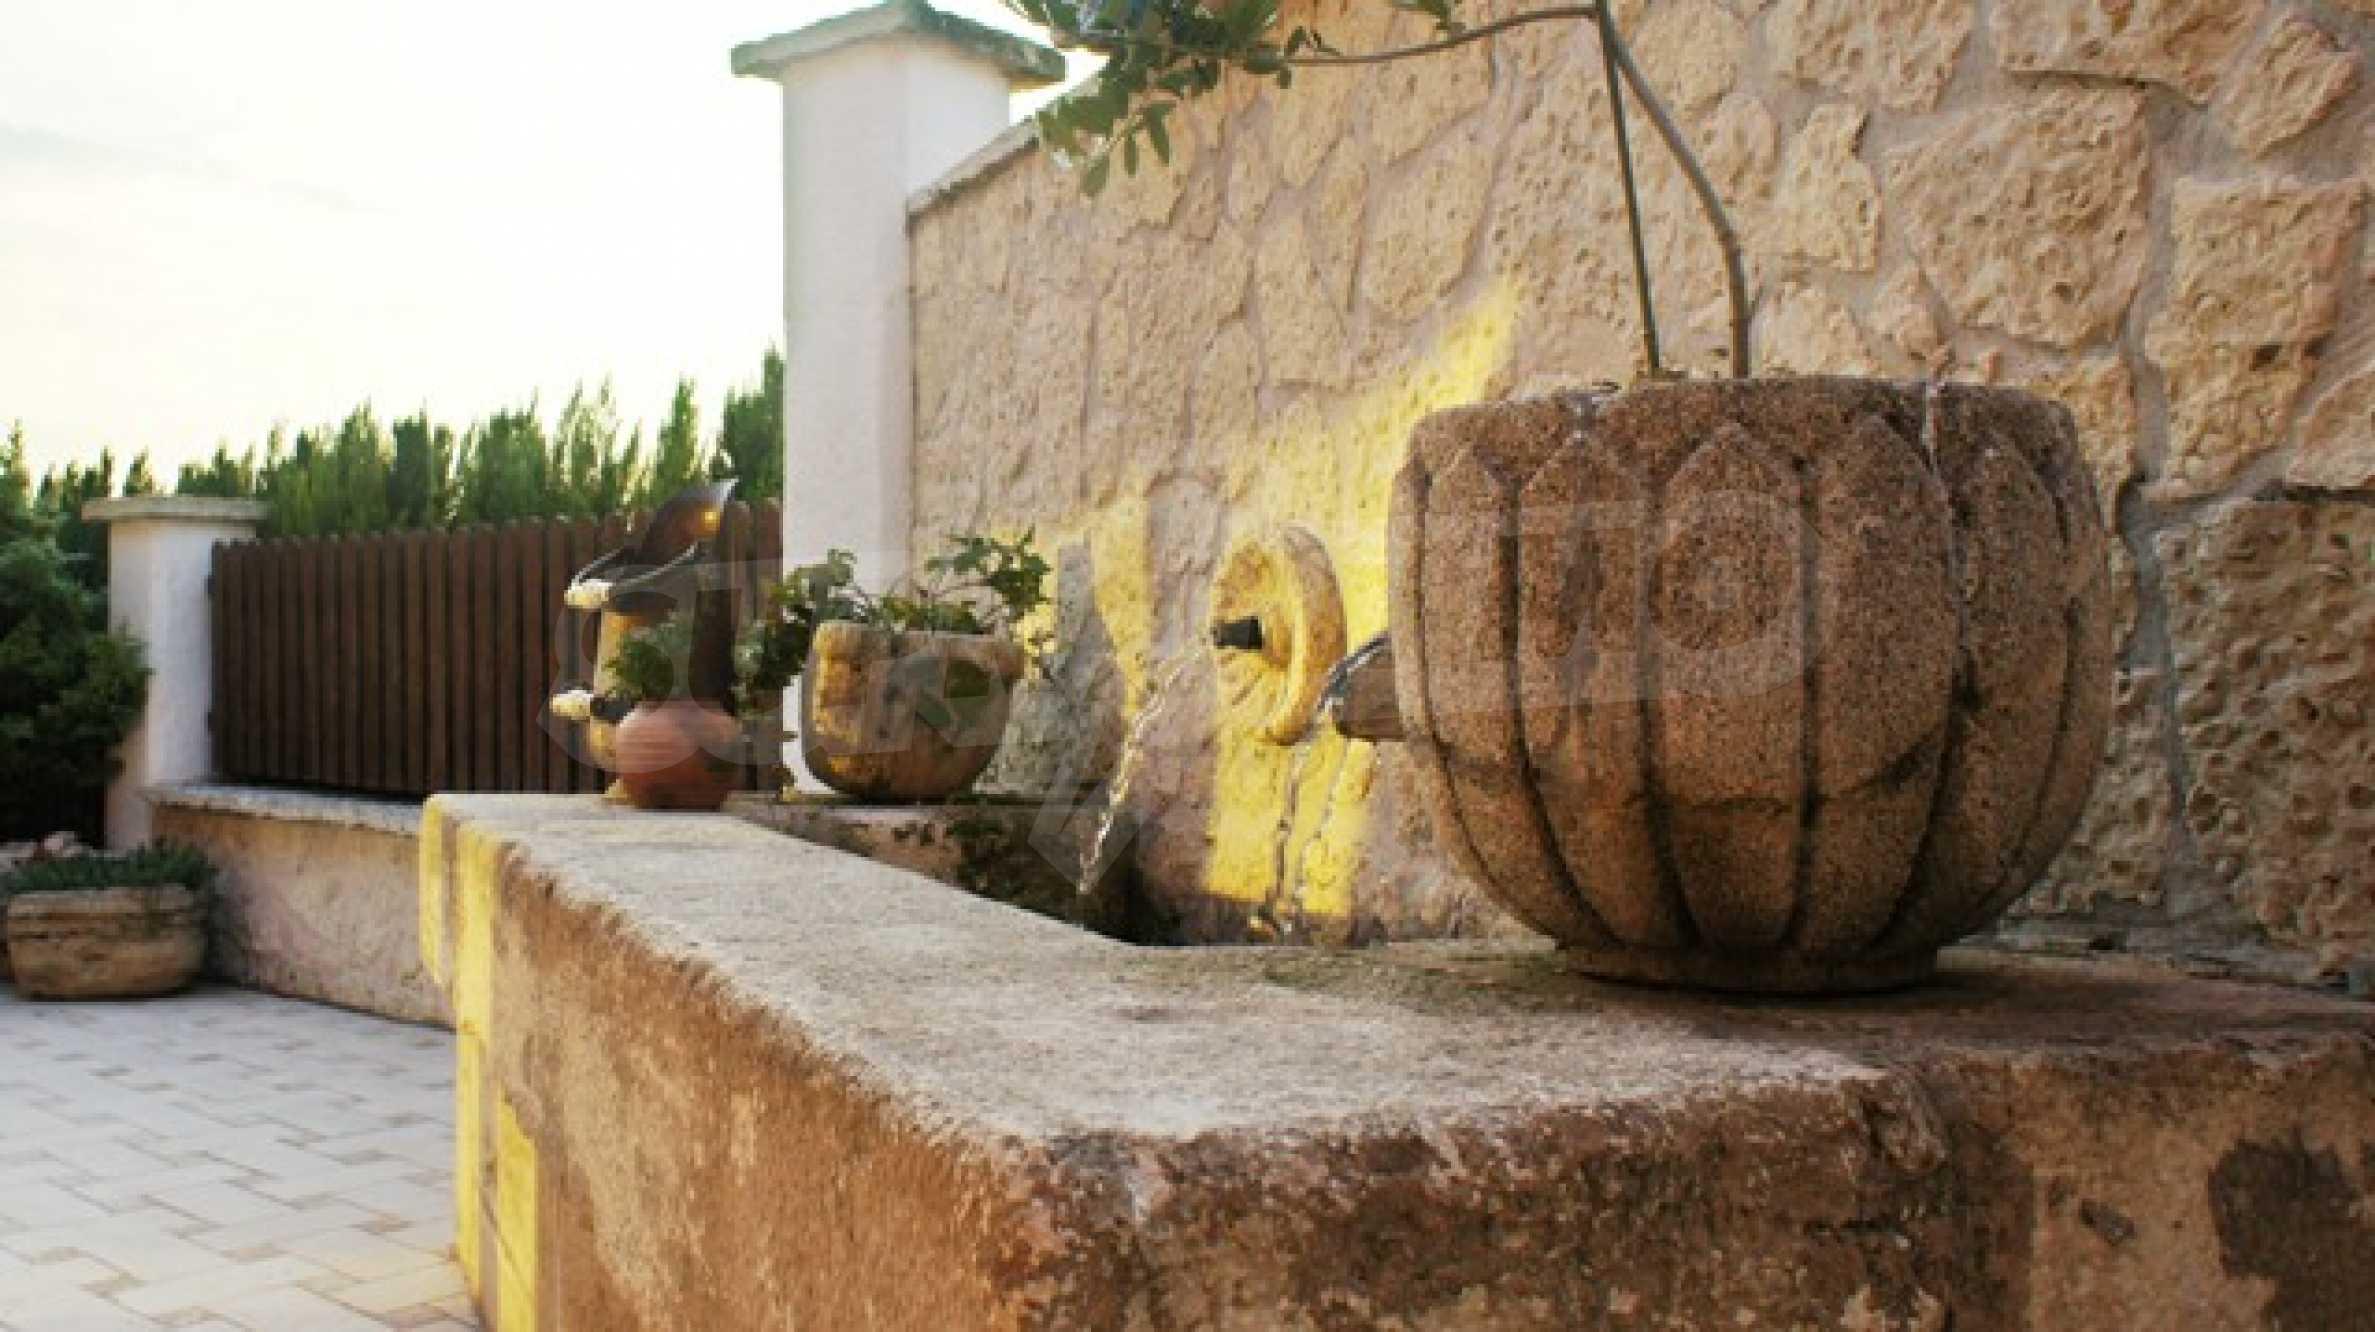 The Mediterranean style - a sense of luxury 26